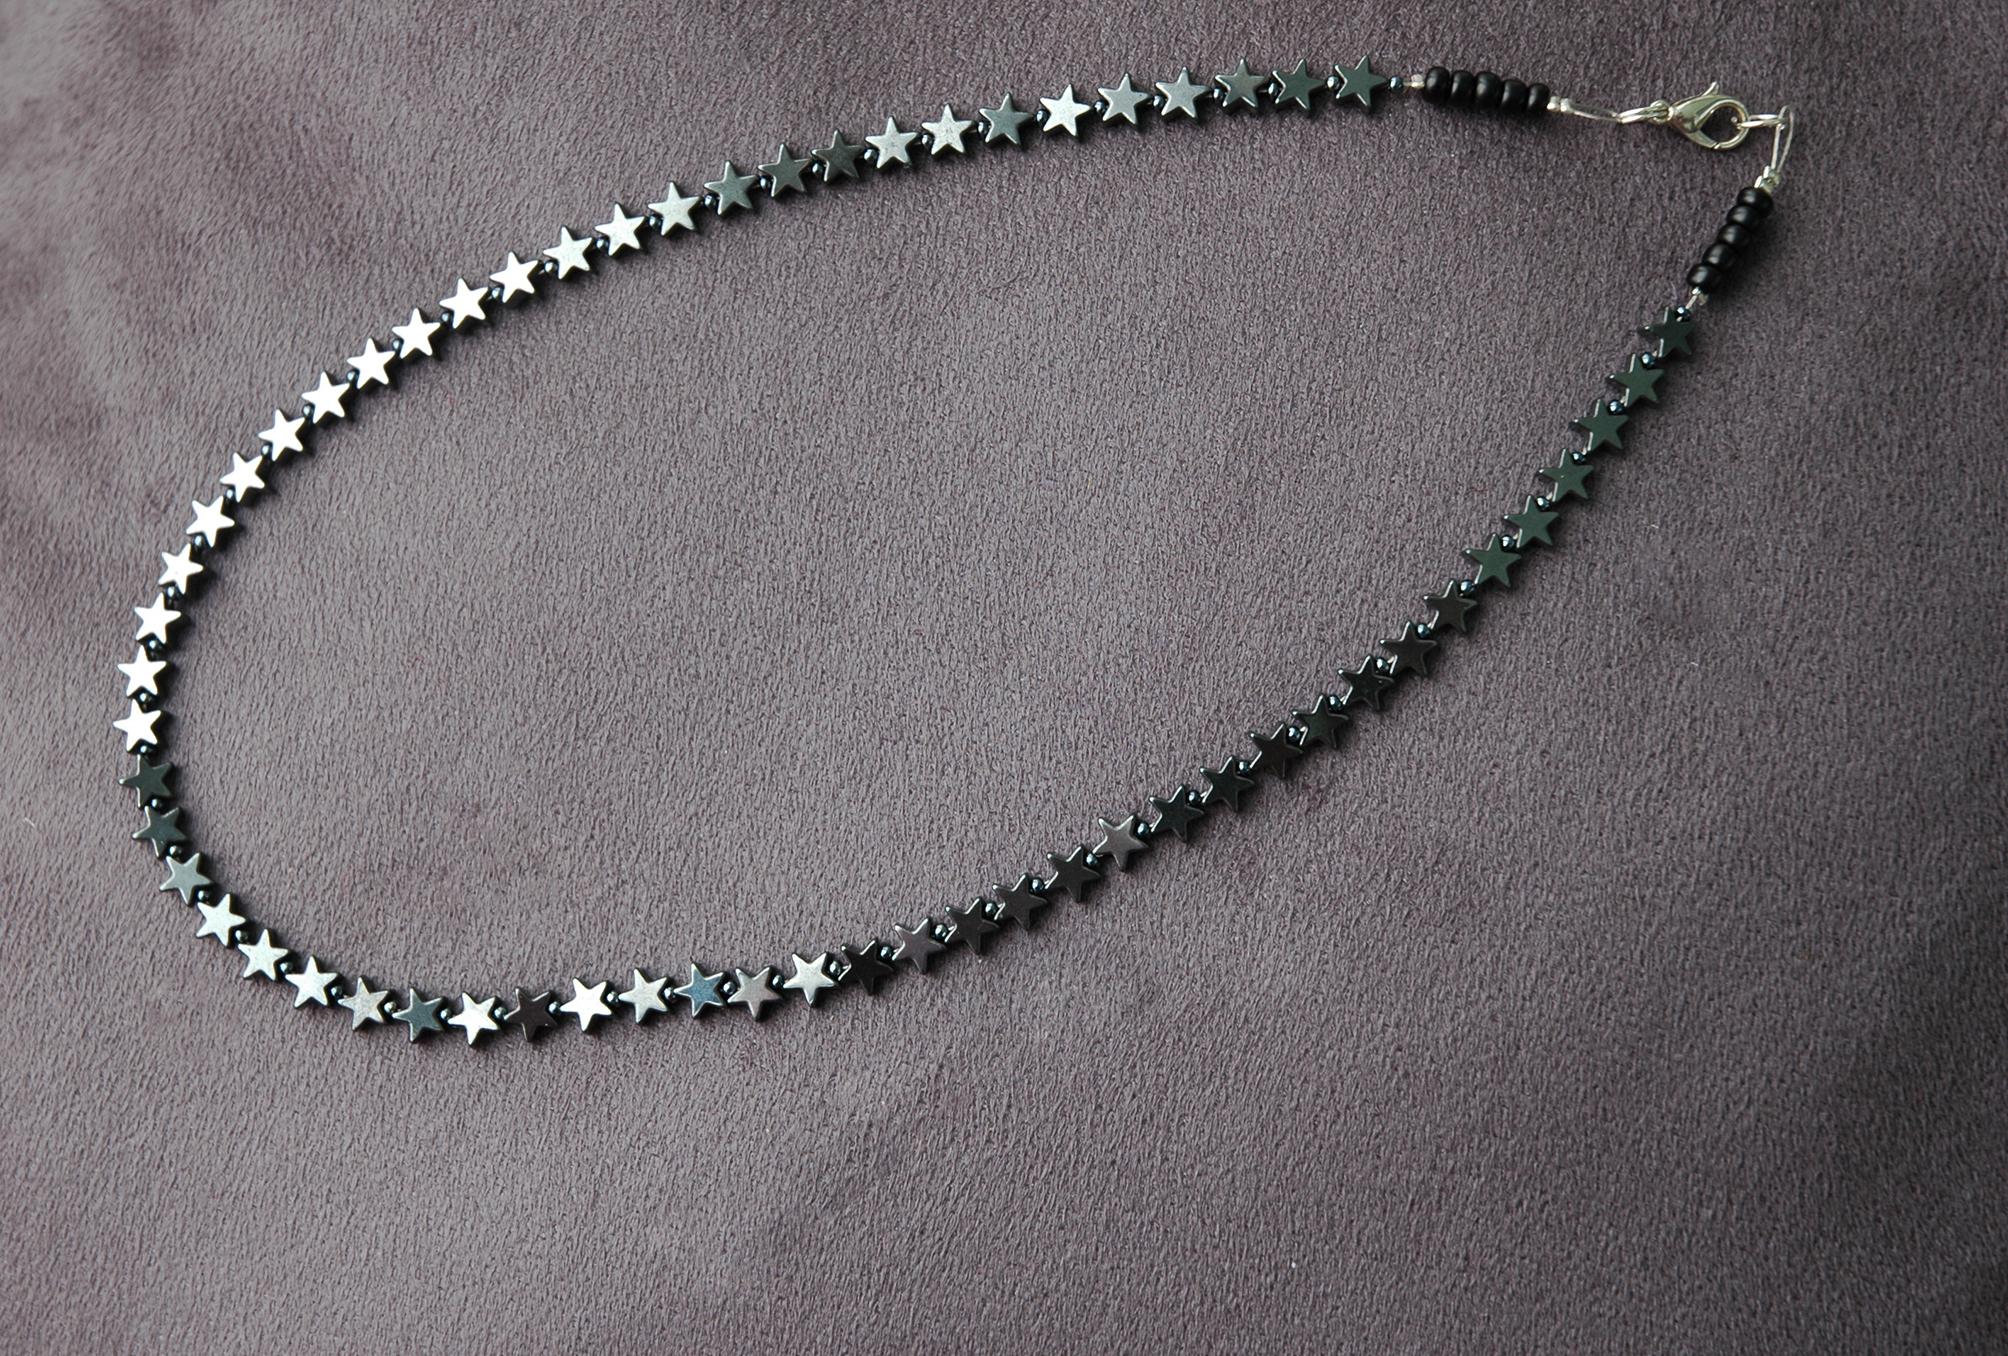 ce718ff73f49 ... Collar de piedras preciosas de hematita STARS II   STARS II hematite  gemstone necklace collier